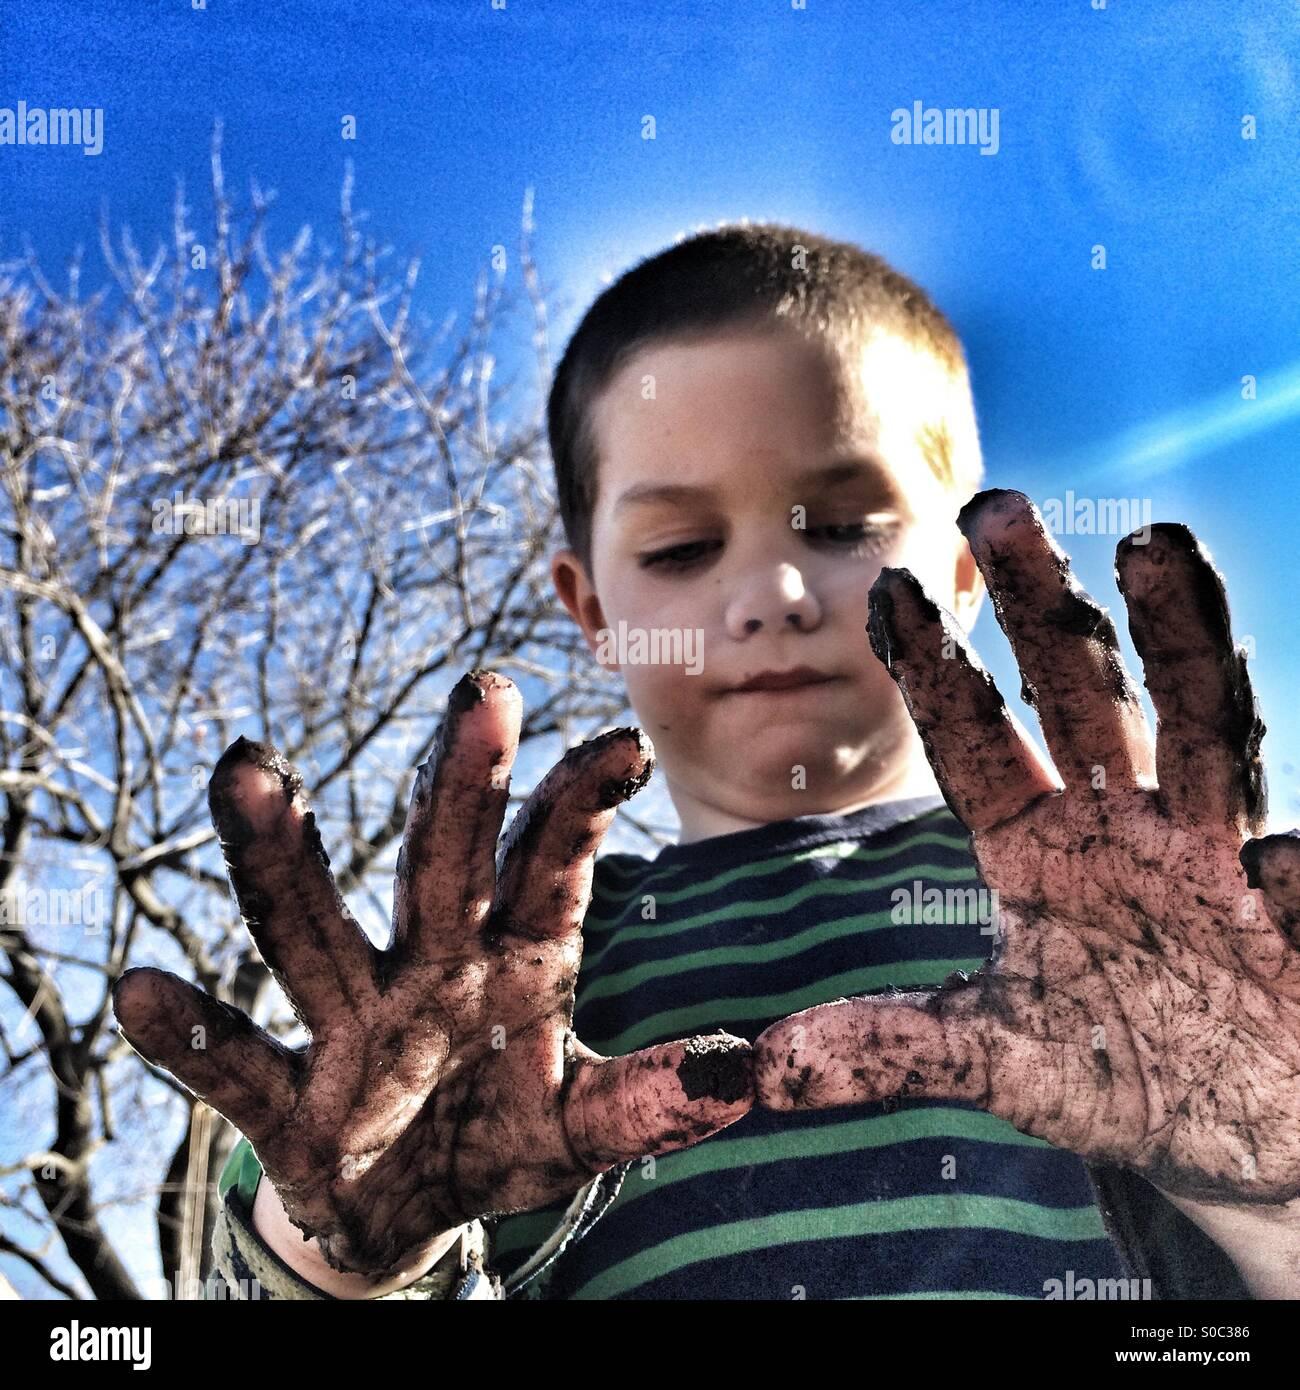 Mr. Muddy Hands - Stock Image